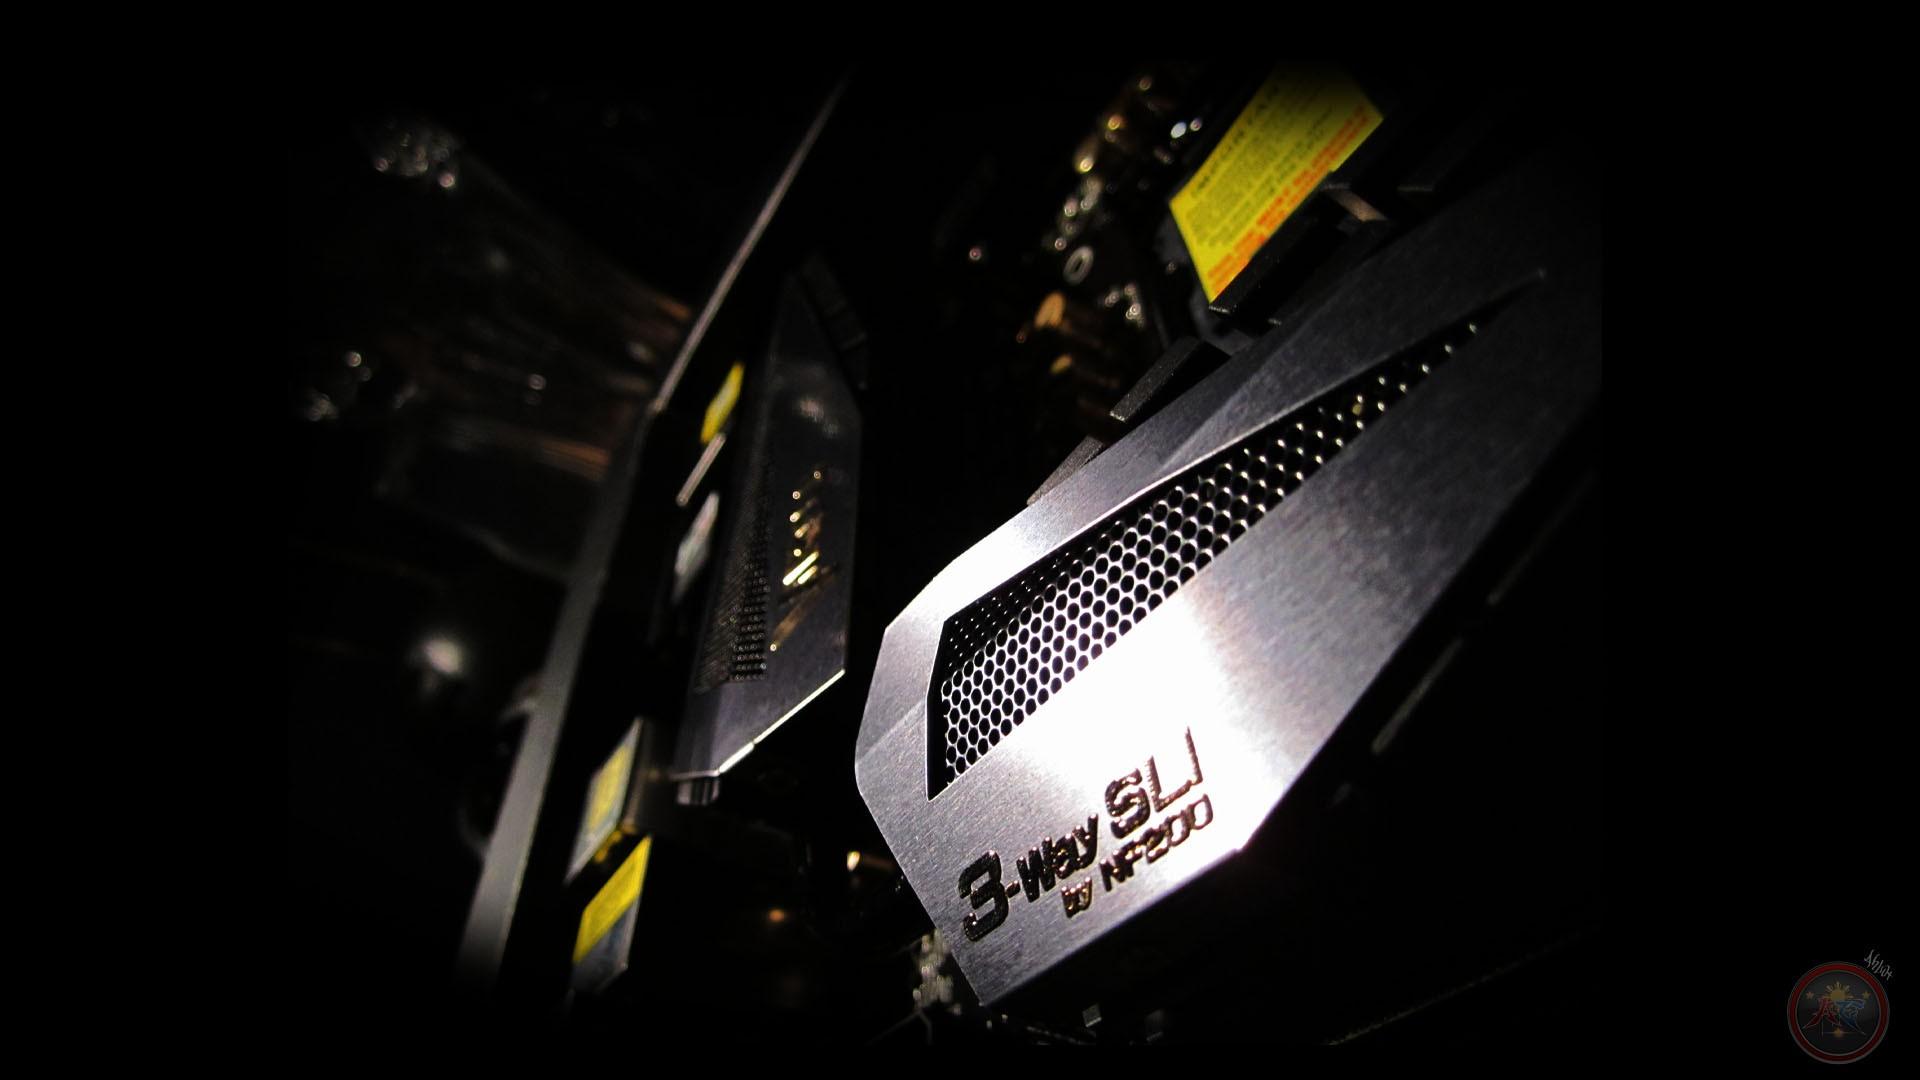 Radeon Bad Wallpaper 1920x1080 Radeon Bad Company Asrock 1920x1080